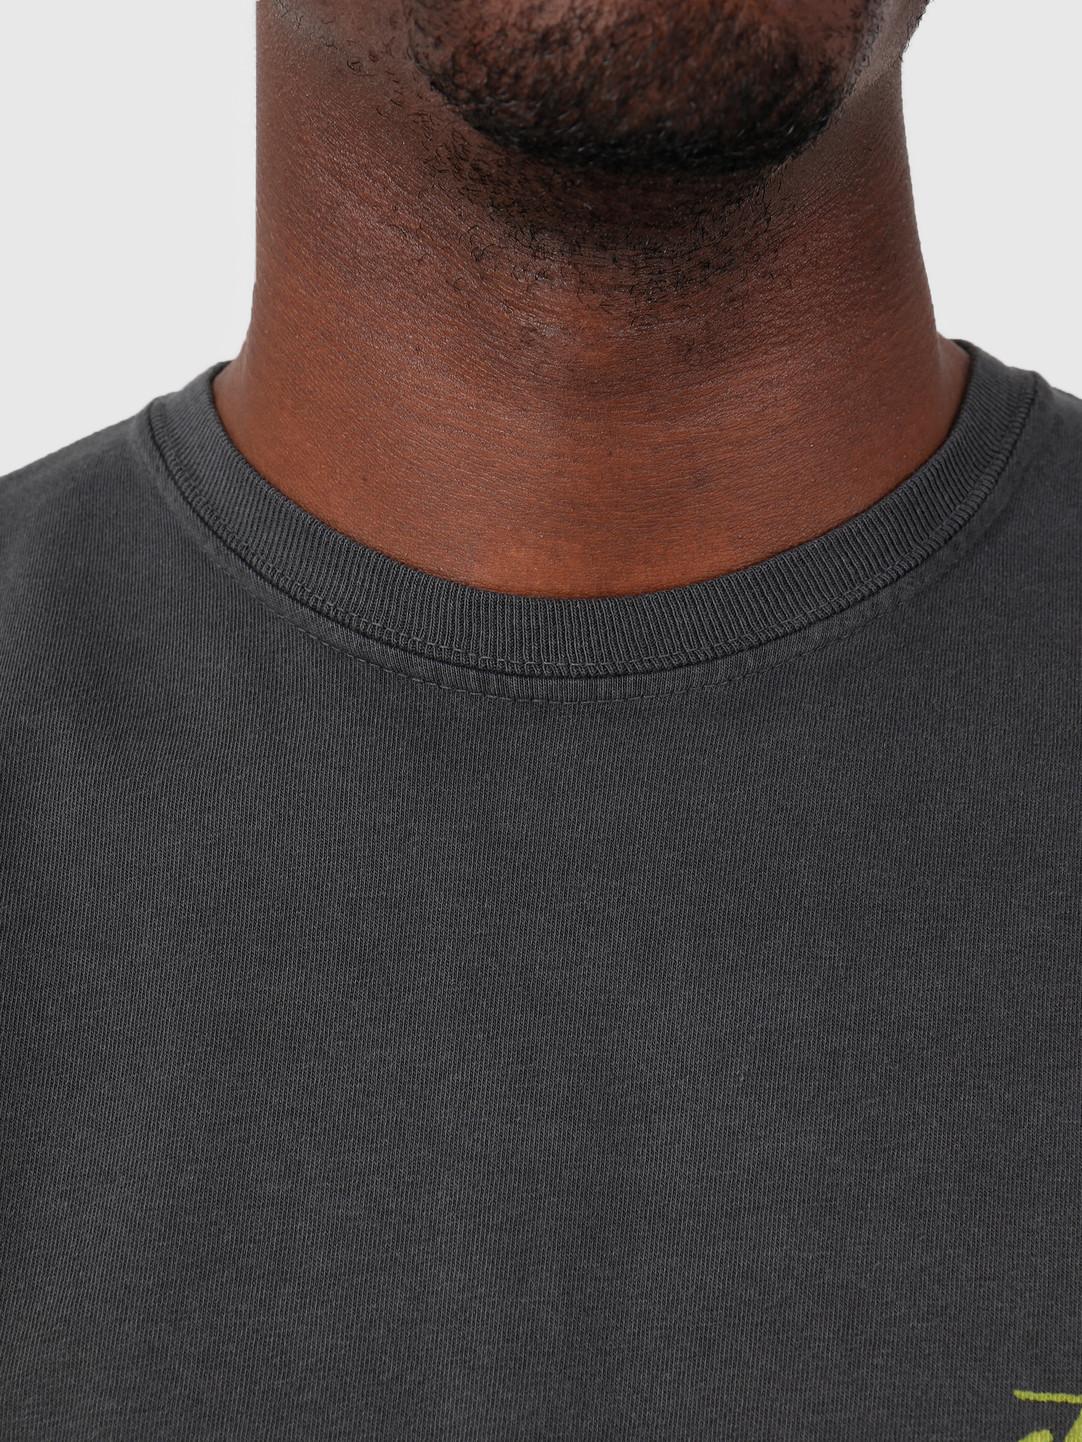 Stussy Stussy Painter Pig Dyed T-Shirt Black 0001